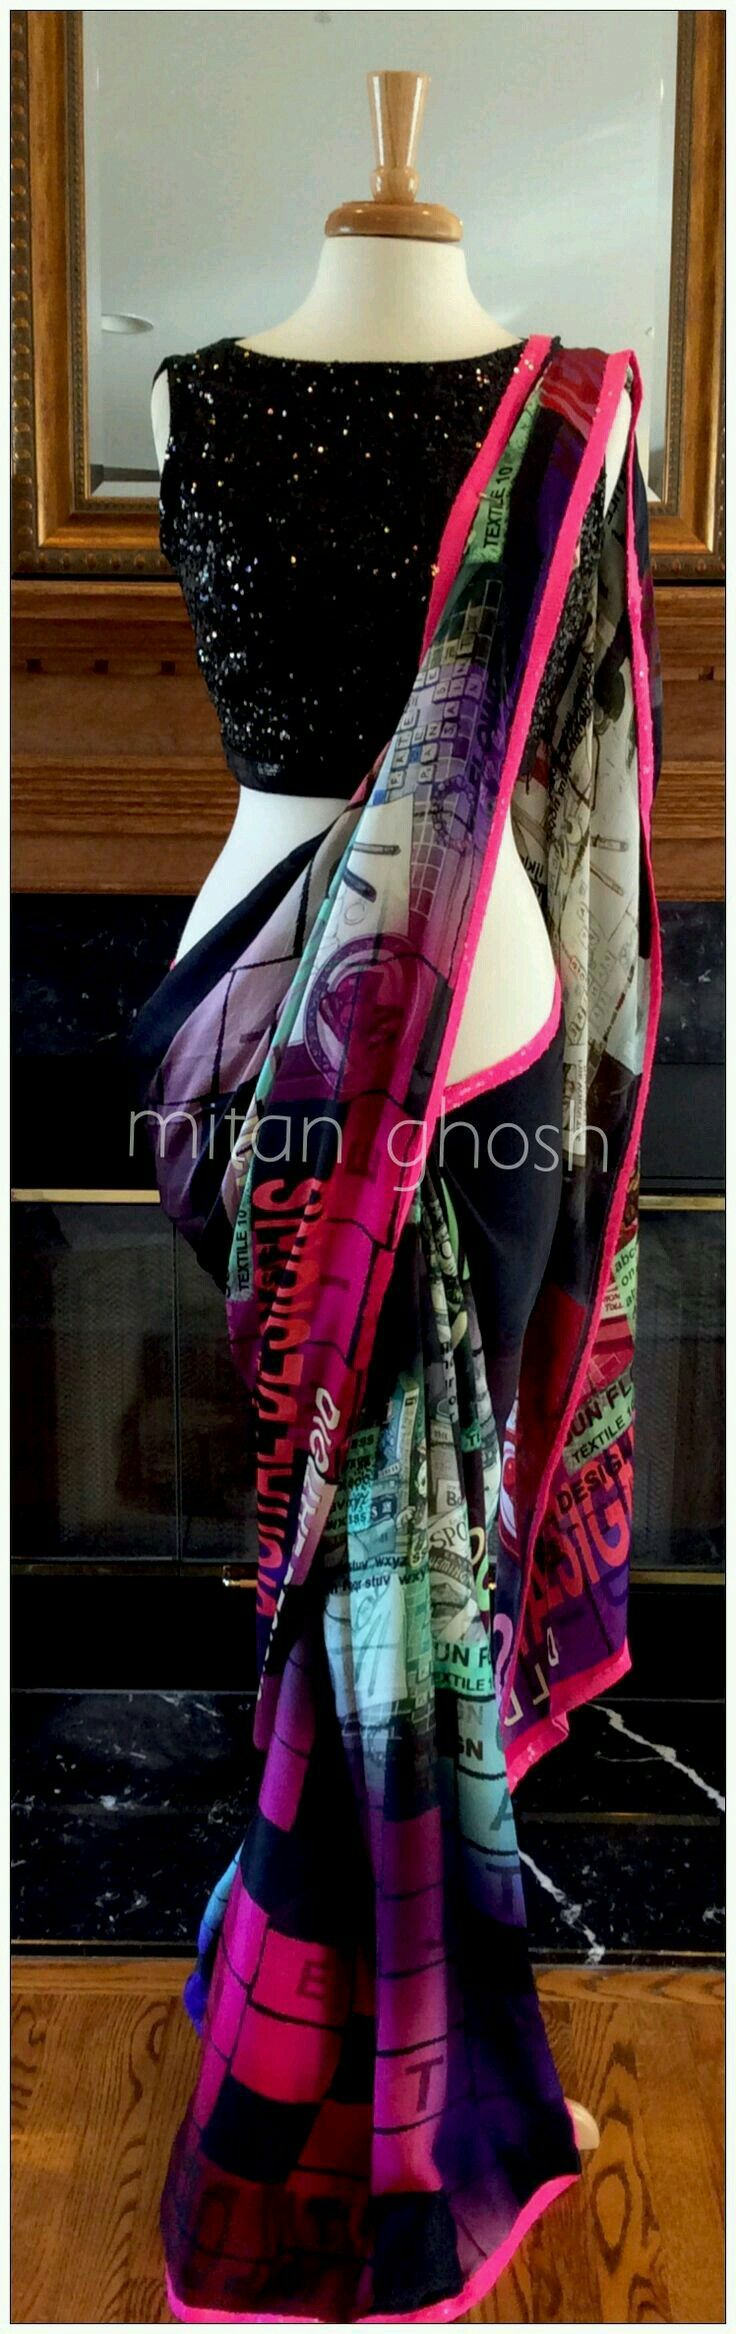 ❤INDIAN OUTFIT❤#ethnic #fashion #indian #indianwear #bridalwear #bollywood #fashionista #style #indianbride #sarees #instafashion #salwarkameez #designer #indianfashion #designerwear #exclusive #saree #instalike #desifashion #anarkali #traditional #womenwear #lehengas #earrings #ootd #gold #indianwedding #partywear #gowns #salwarsuit #dress #beautiful #kundan #bollywoodfashion #asianwedding #pakifashion. For More Follow Pinterest : @reetk516